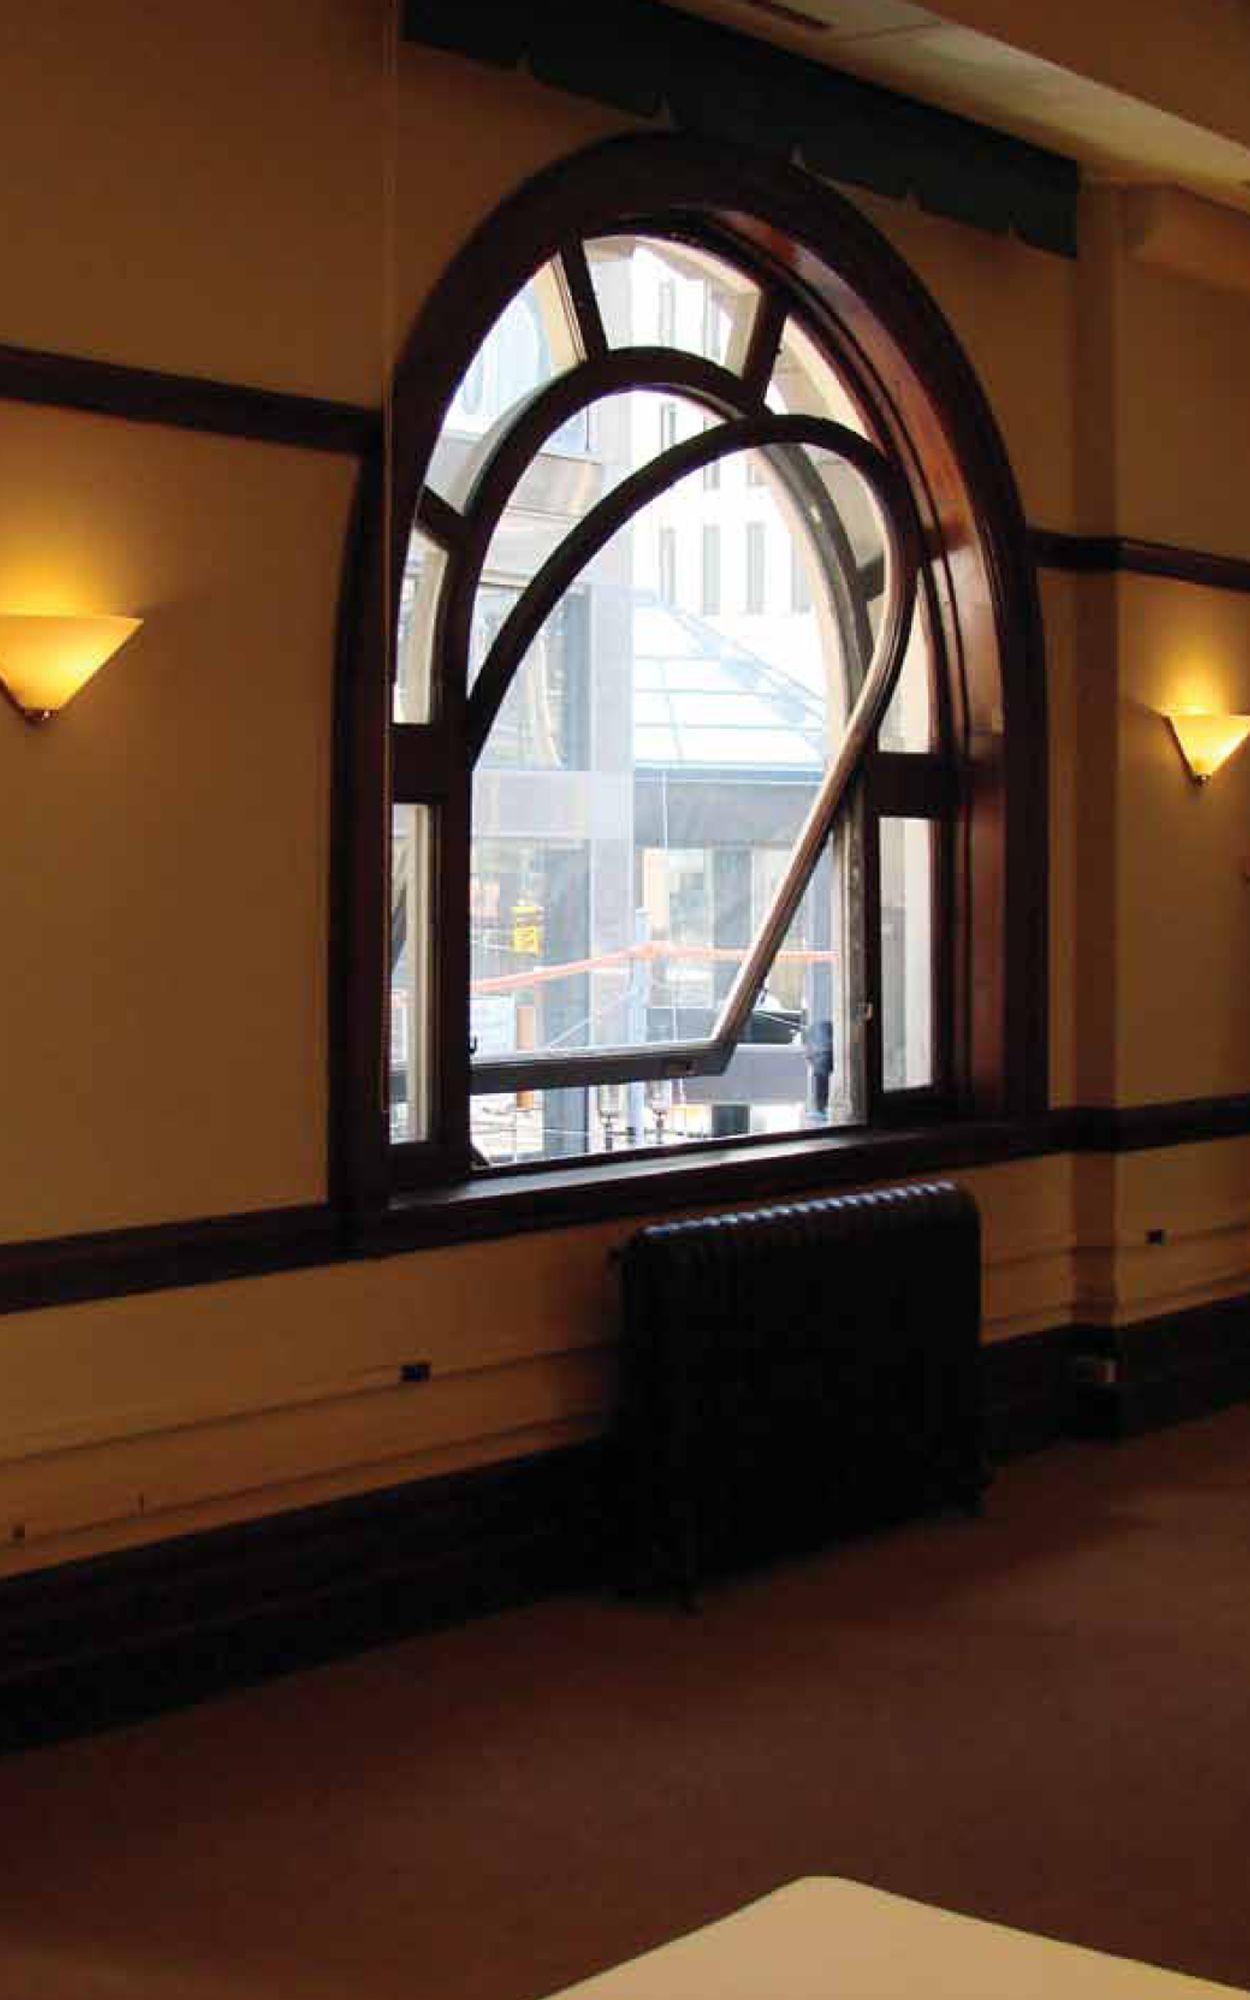 Operable windows, 10 Adelaide Street, Toronto, Ontario Heritage Trust (image source: Ontario Heritage Trust)